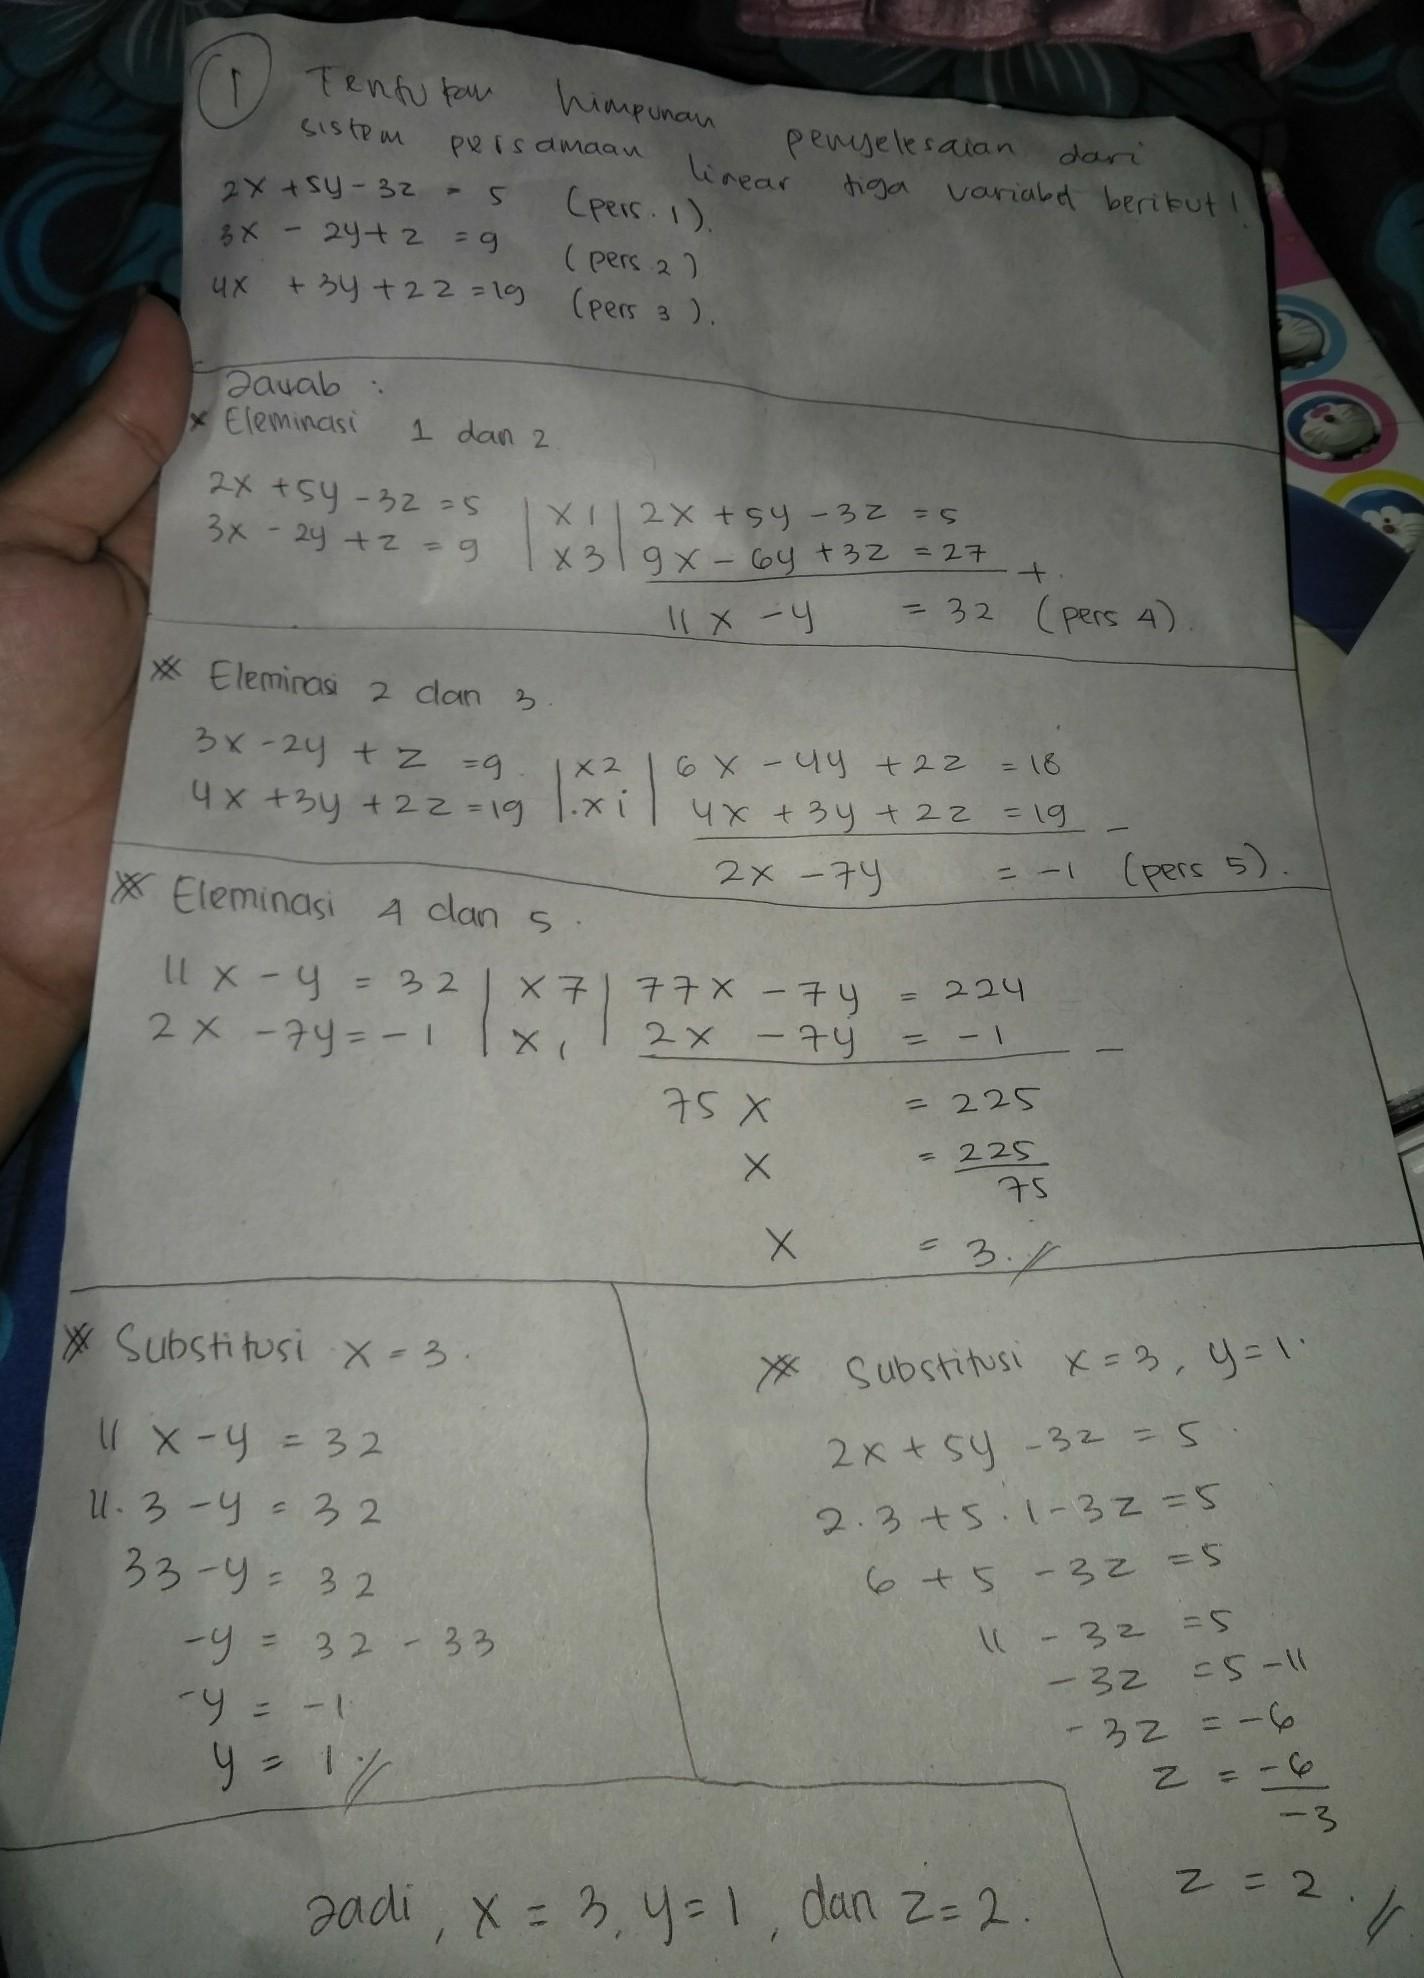 Persamaan Linear Tiga Variabel (Metode Eliminasi Gauss